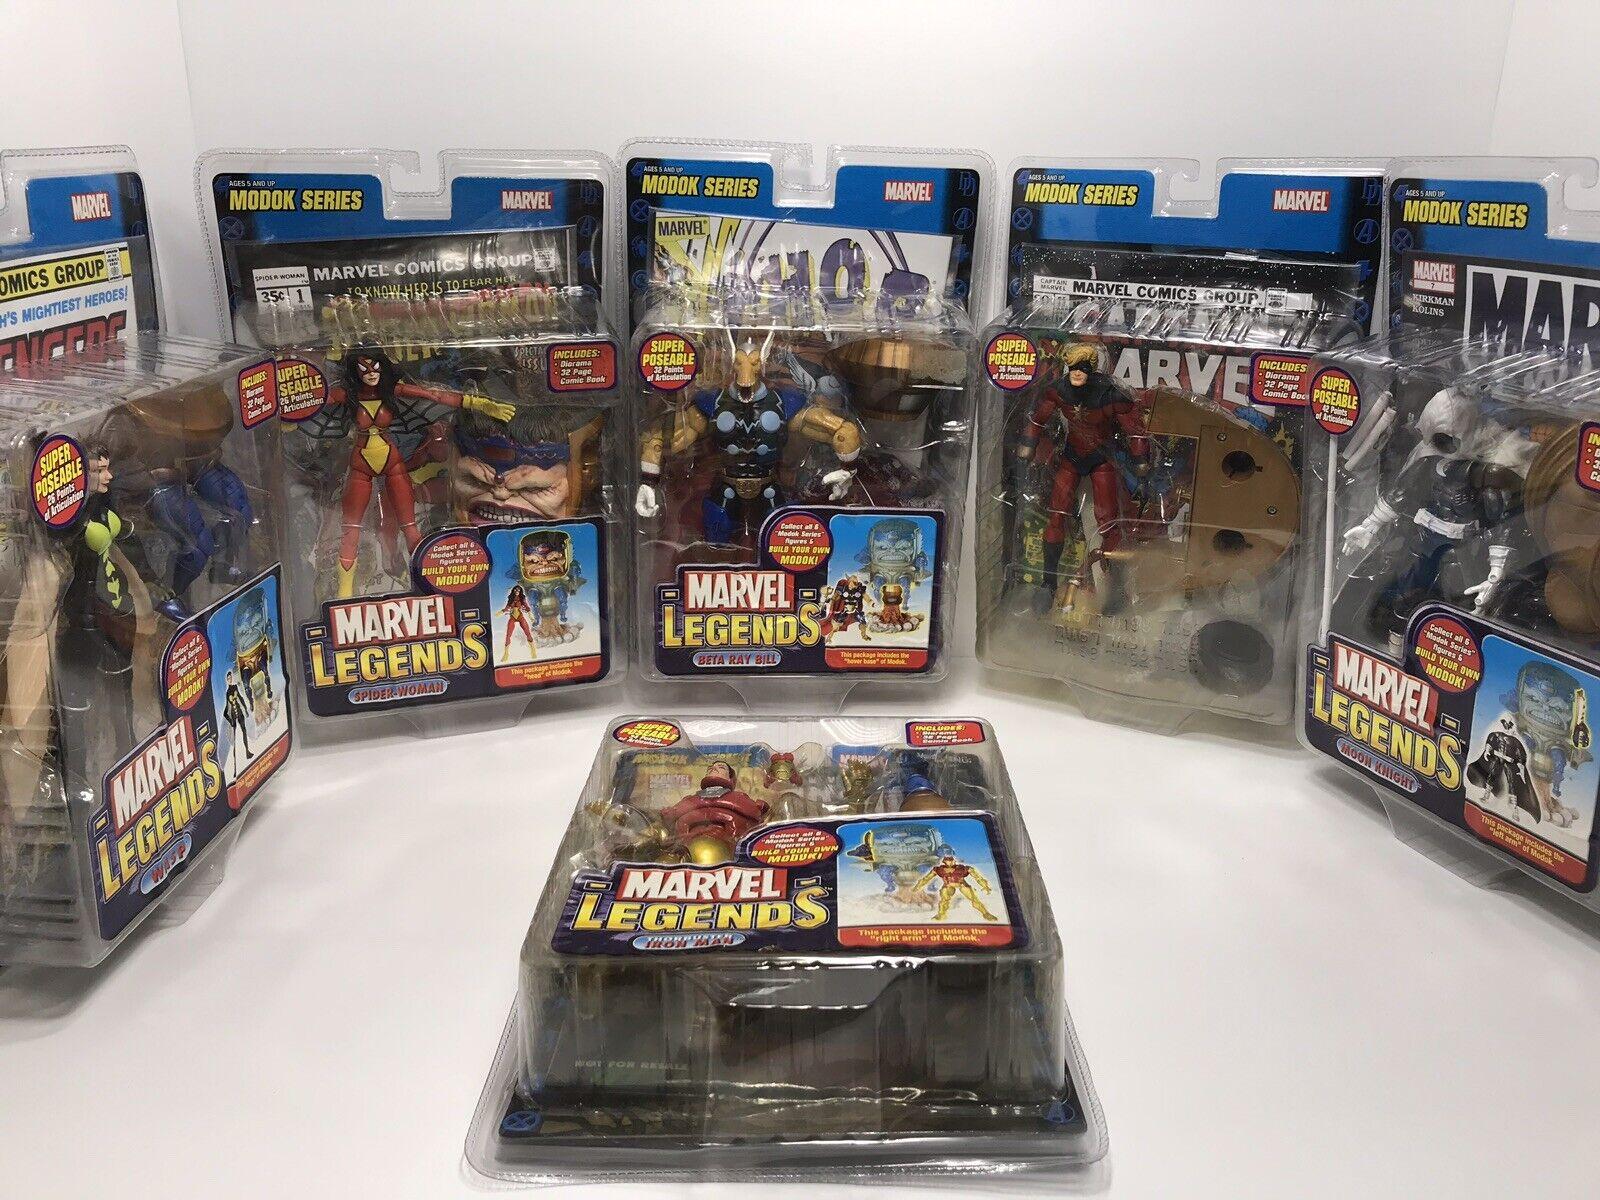 Marvel Legends Modok Series Set Of 6 Action Figures 2006